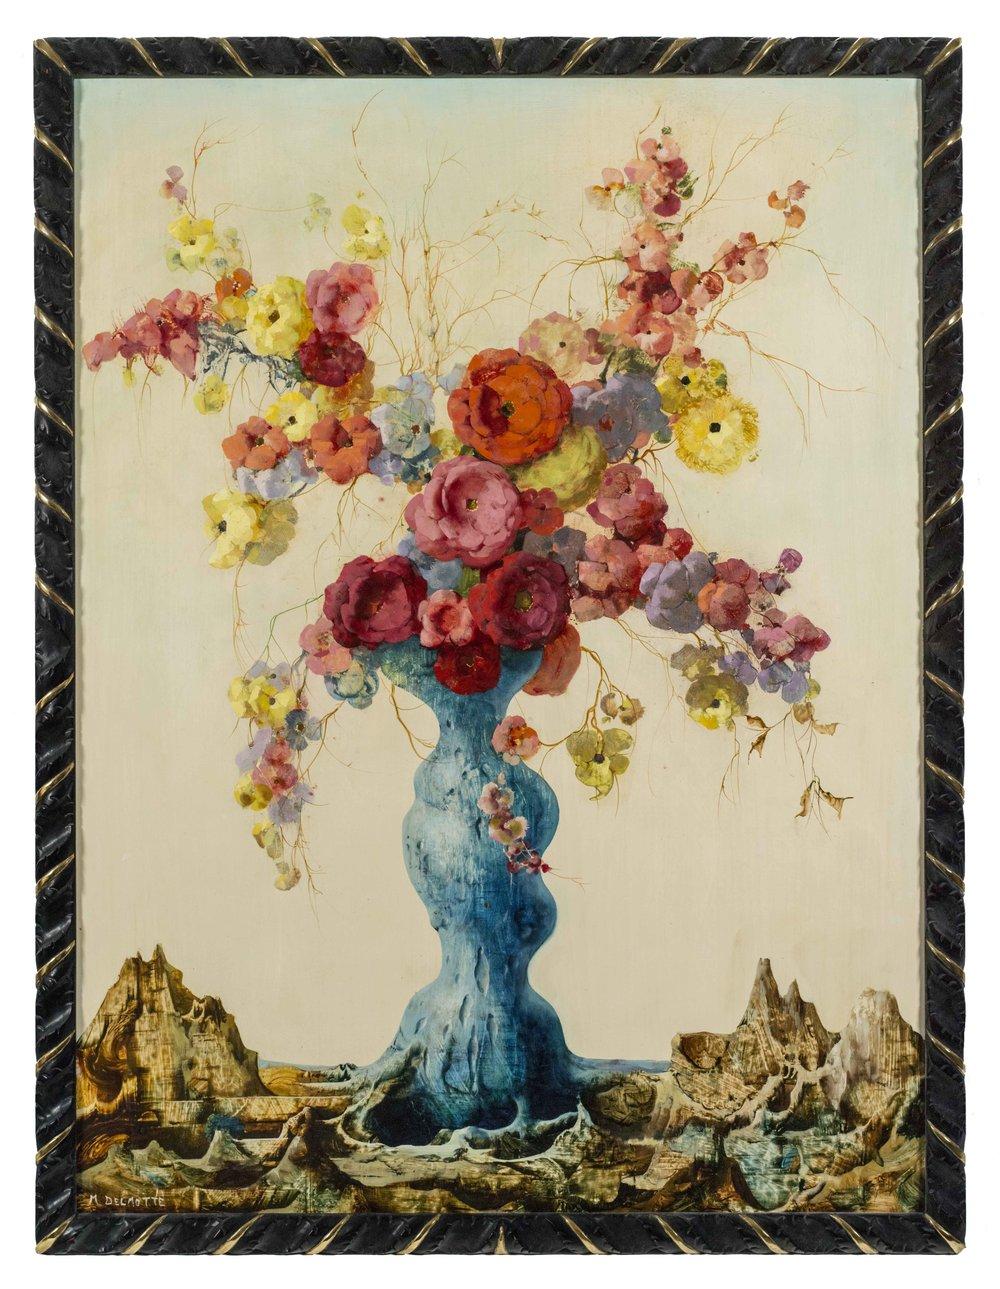 Flowers in blue vase with rocky landscape.jpg.jpg